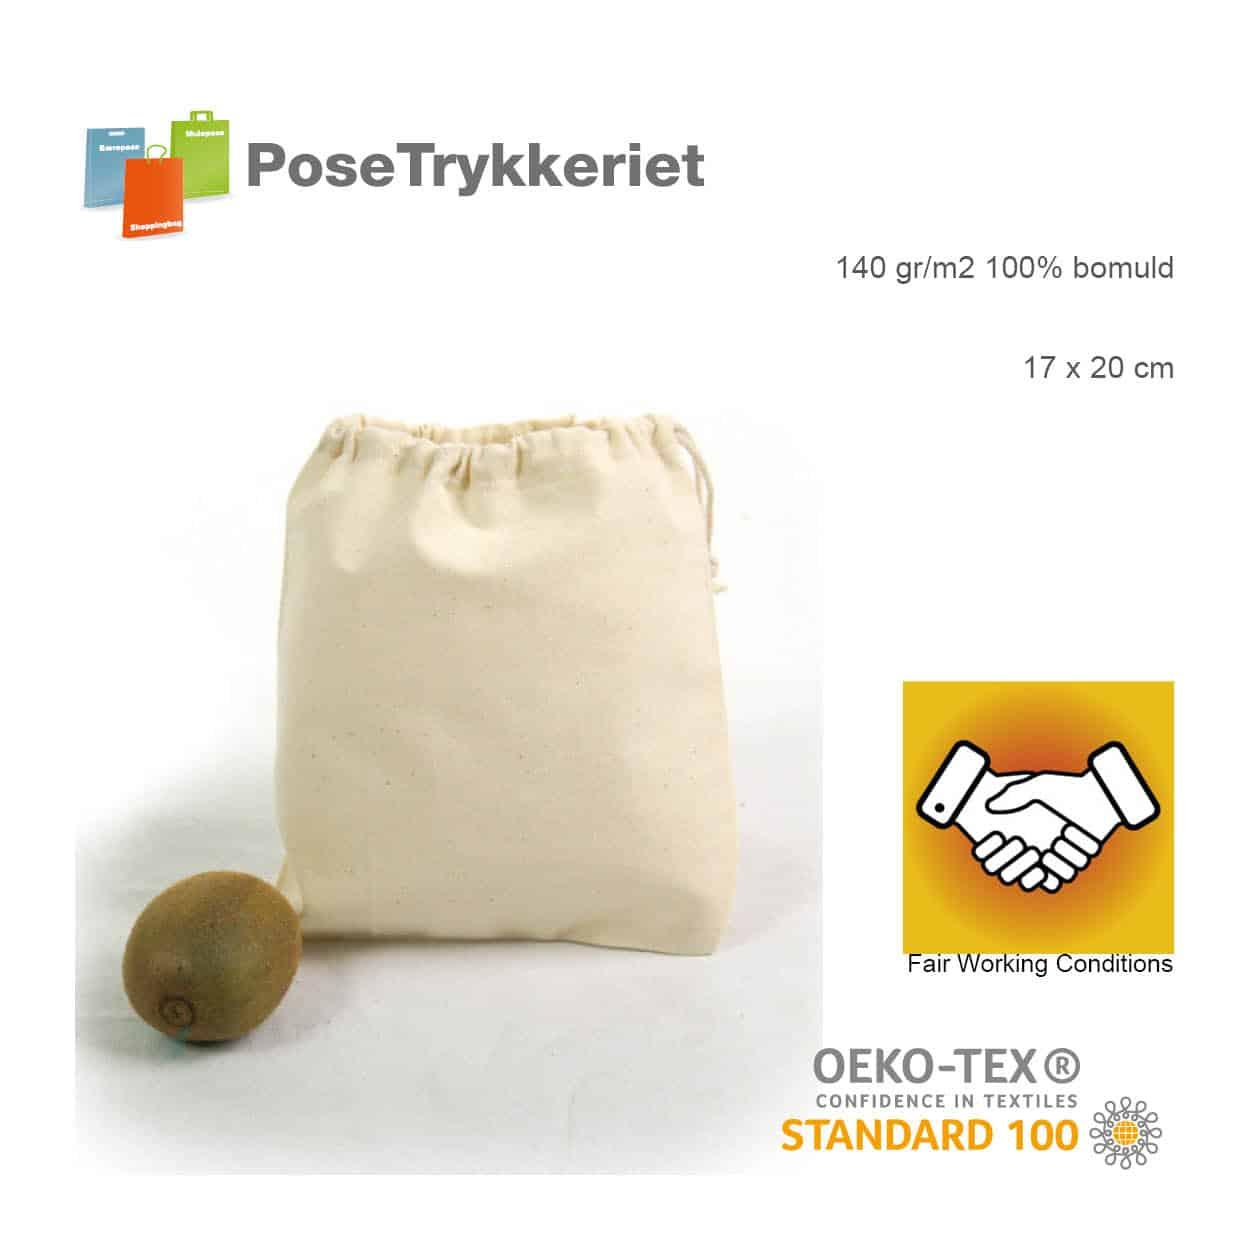 Bomulds snøreposer str. 17 x 20 cm. Posetrykkeriet.dk